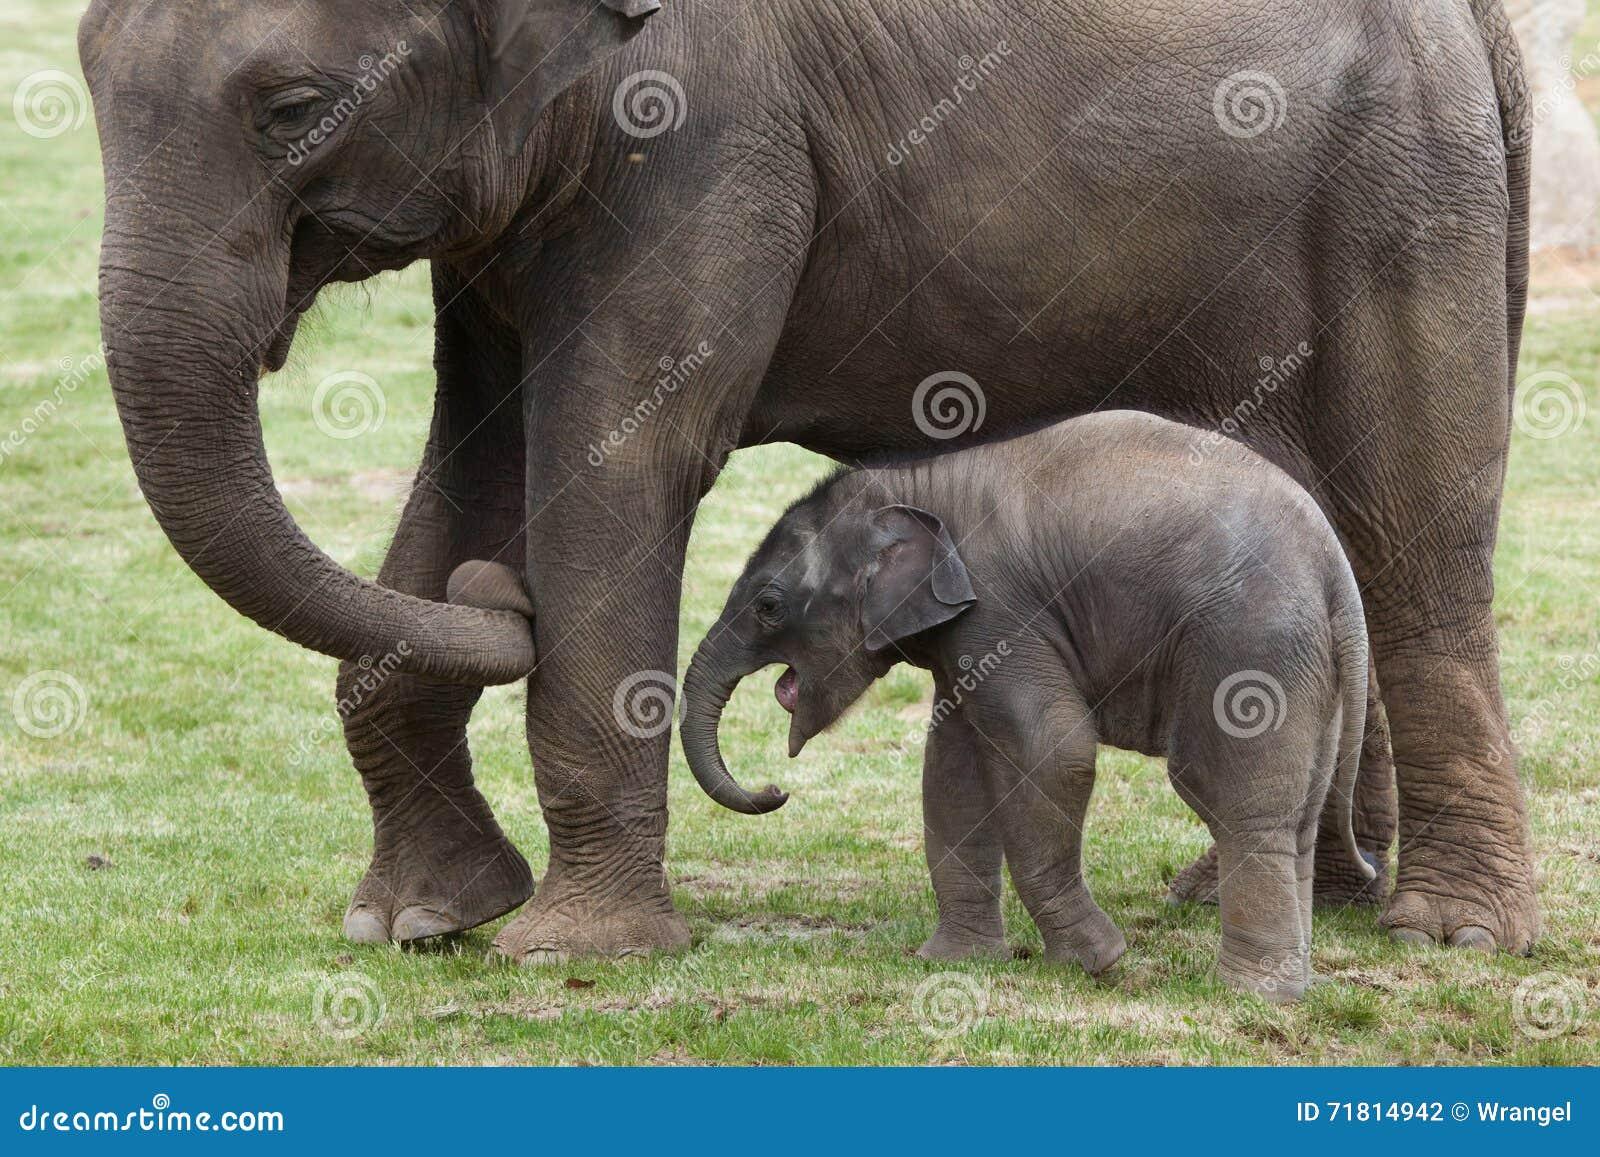 einmonatiger indischer elefant elephas maximus indicus